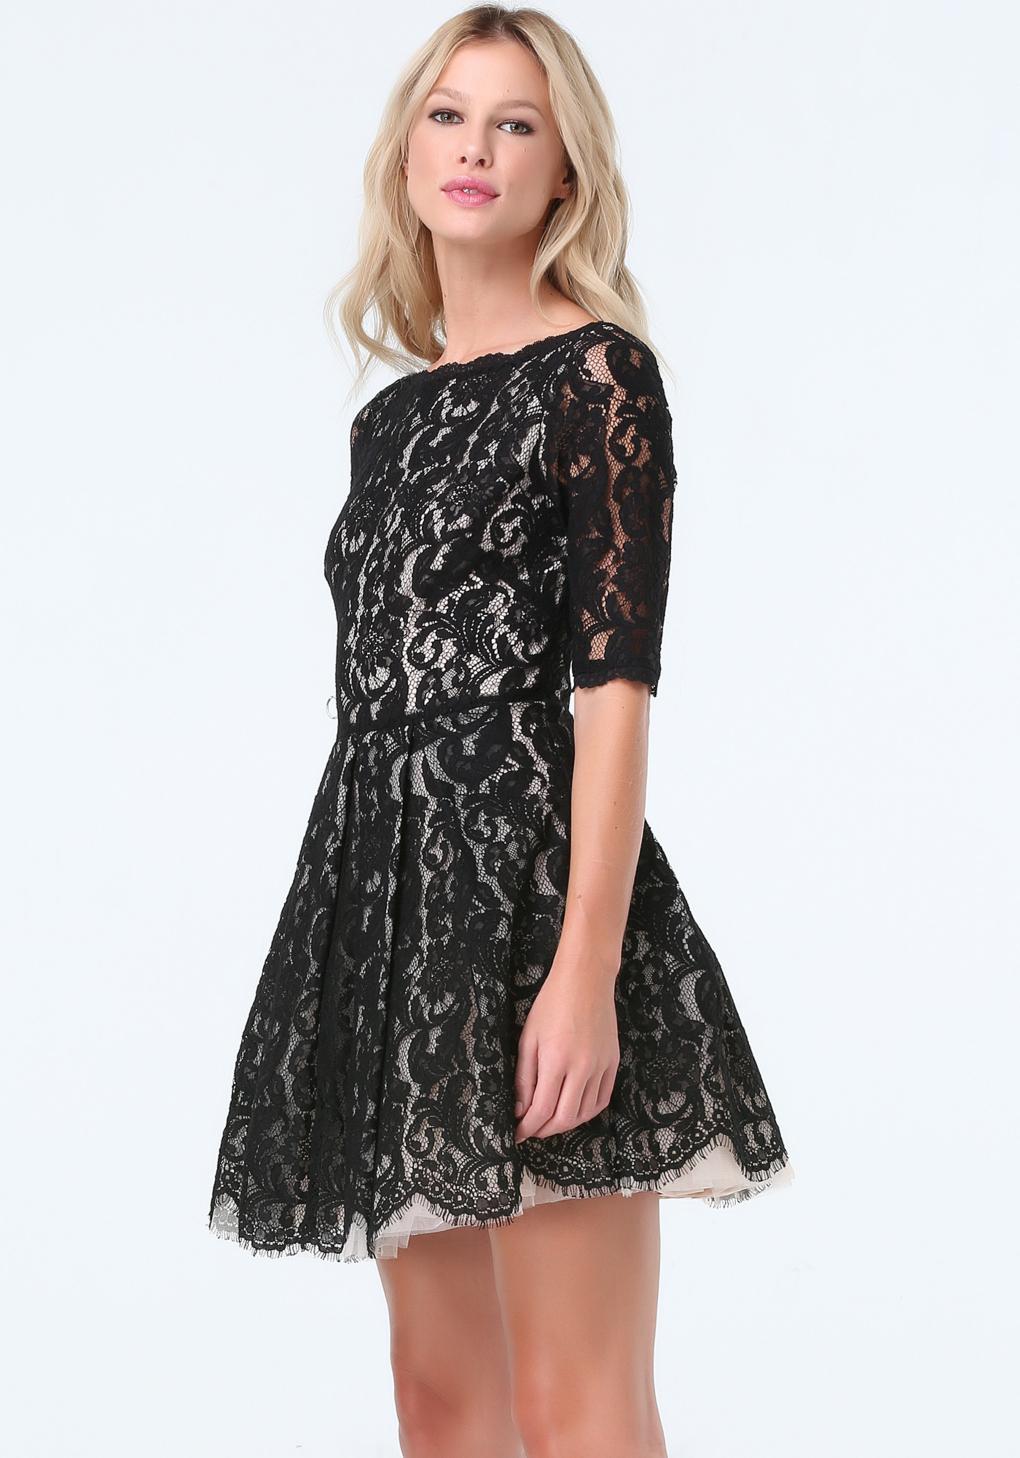 9d1b741cf82 Bebe Lace Fit   Flare Dress in Black - Lyst